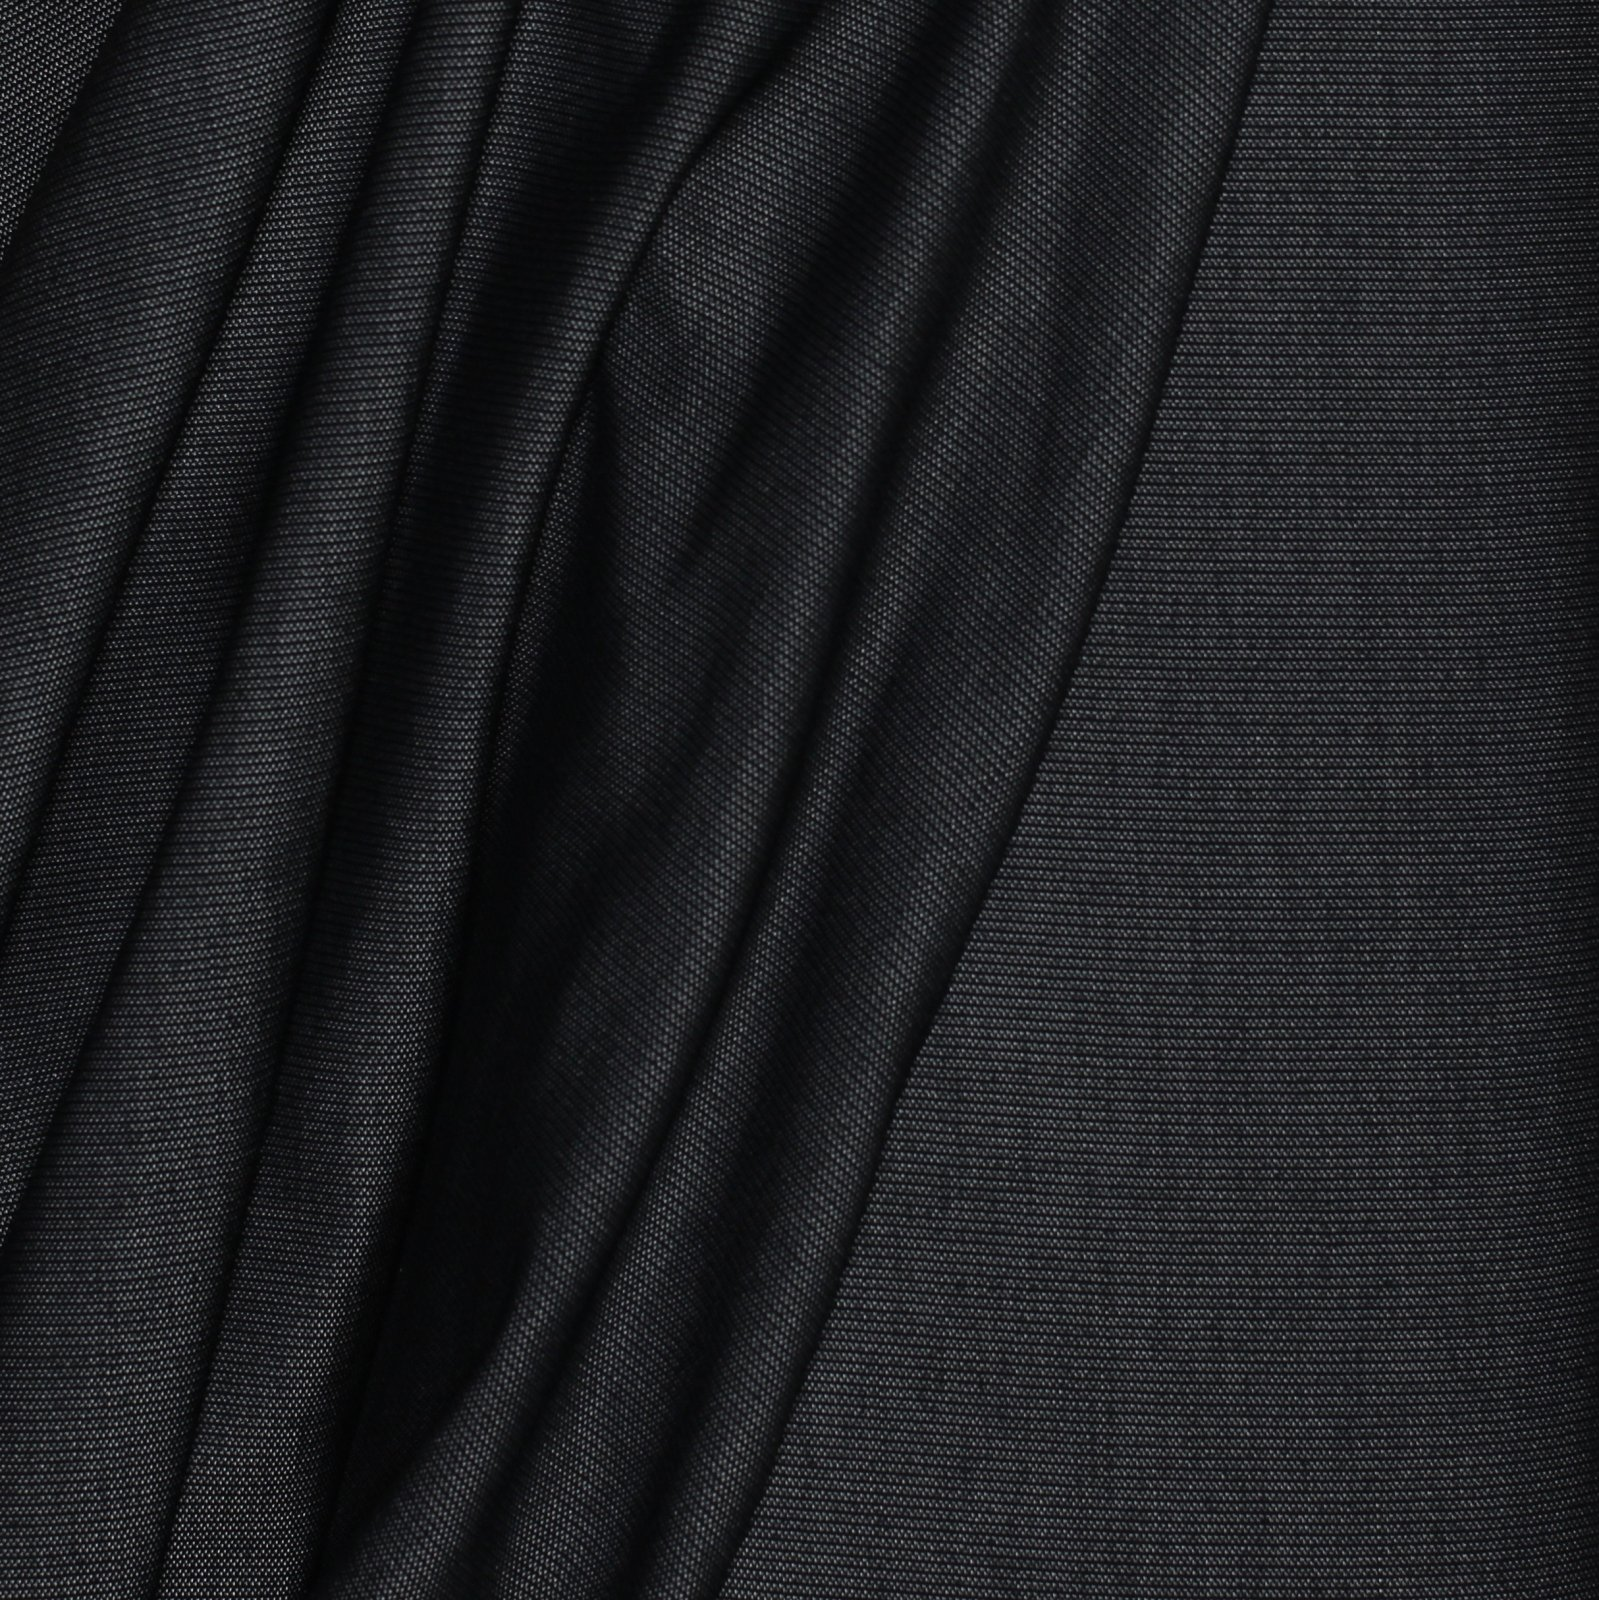 Black/White w/Taupe backing Italian Wool Blend